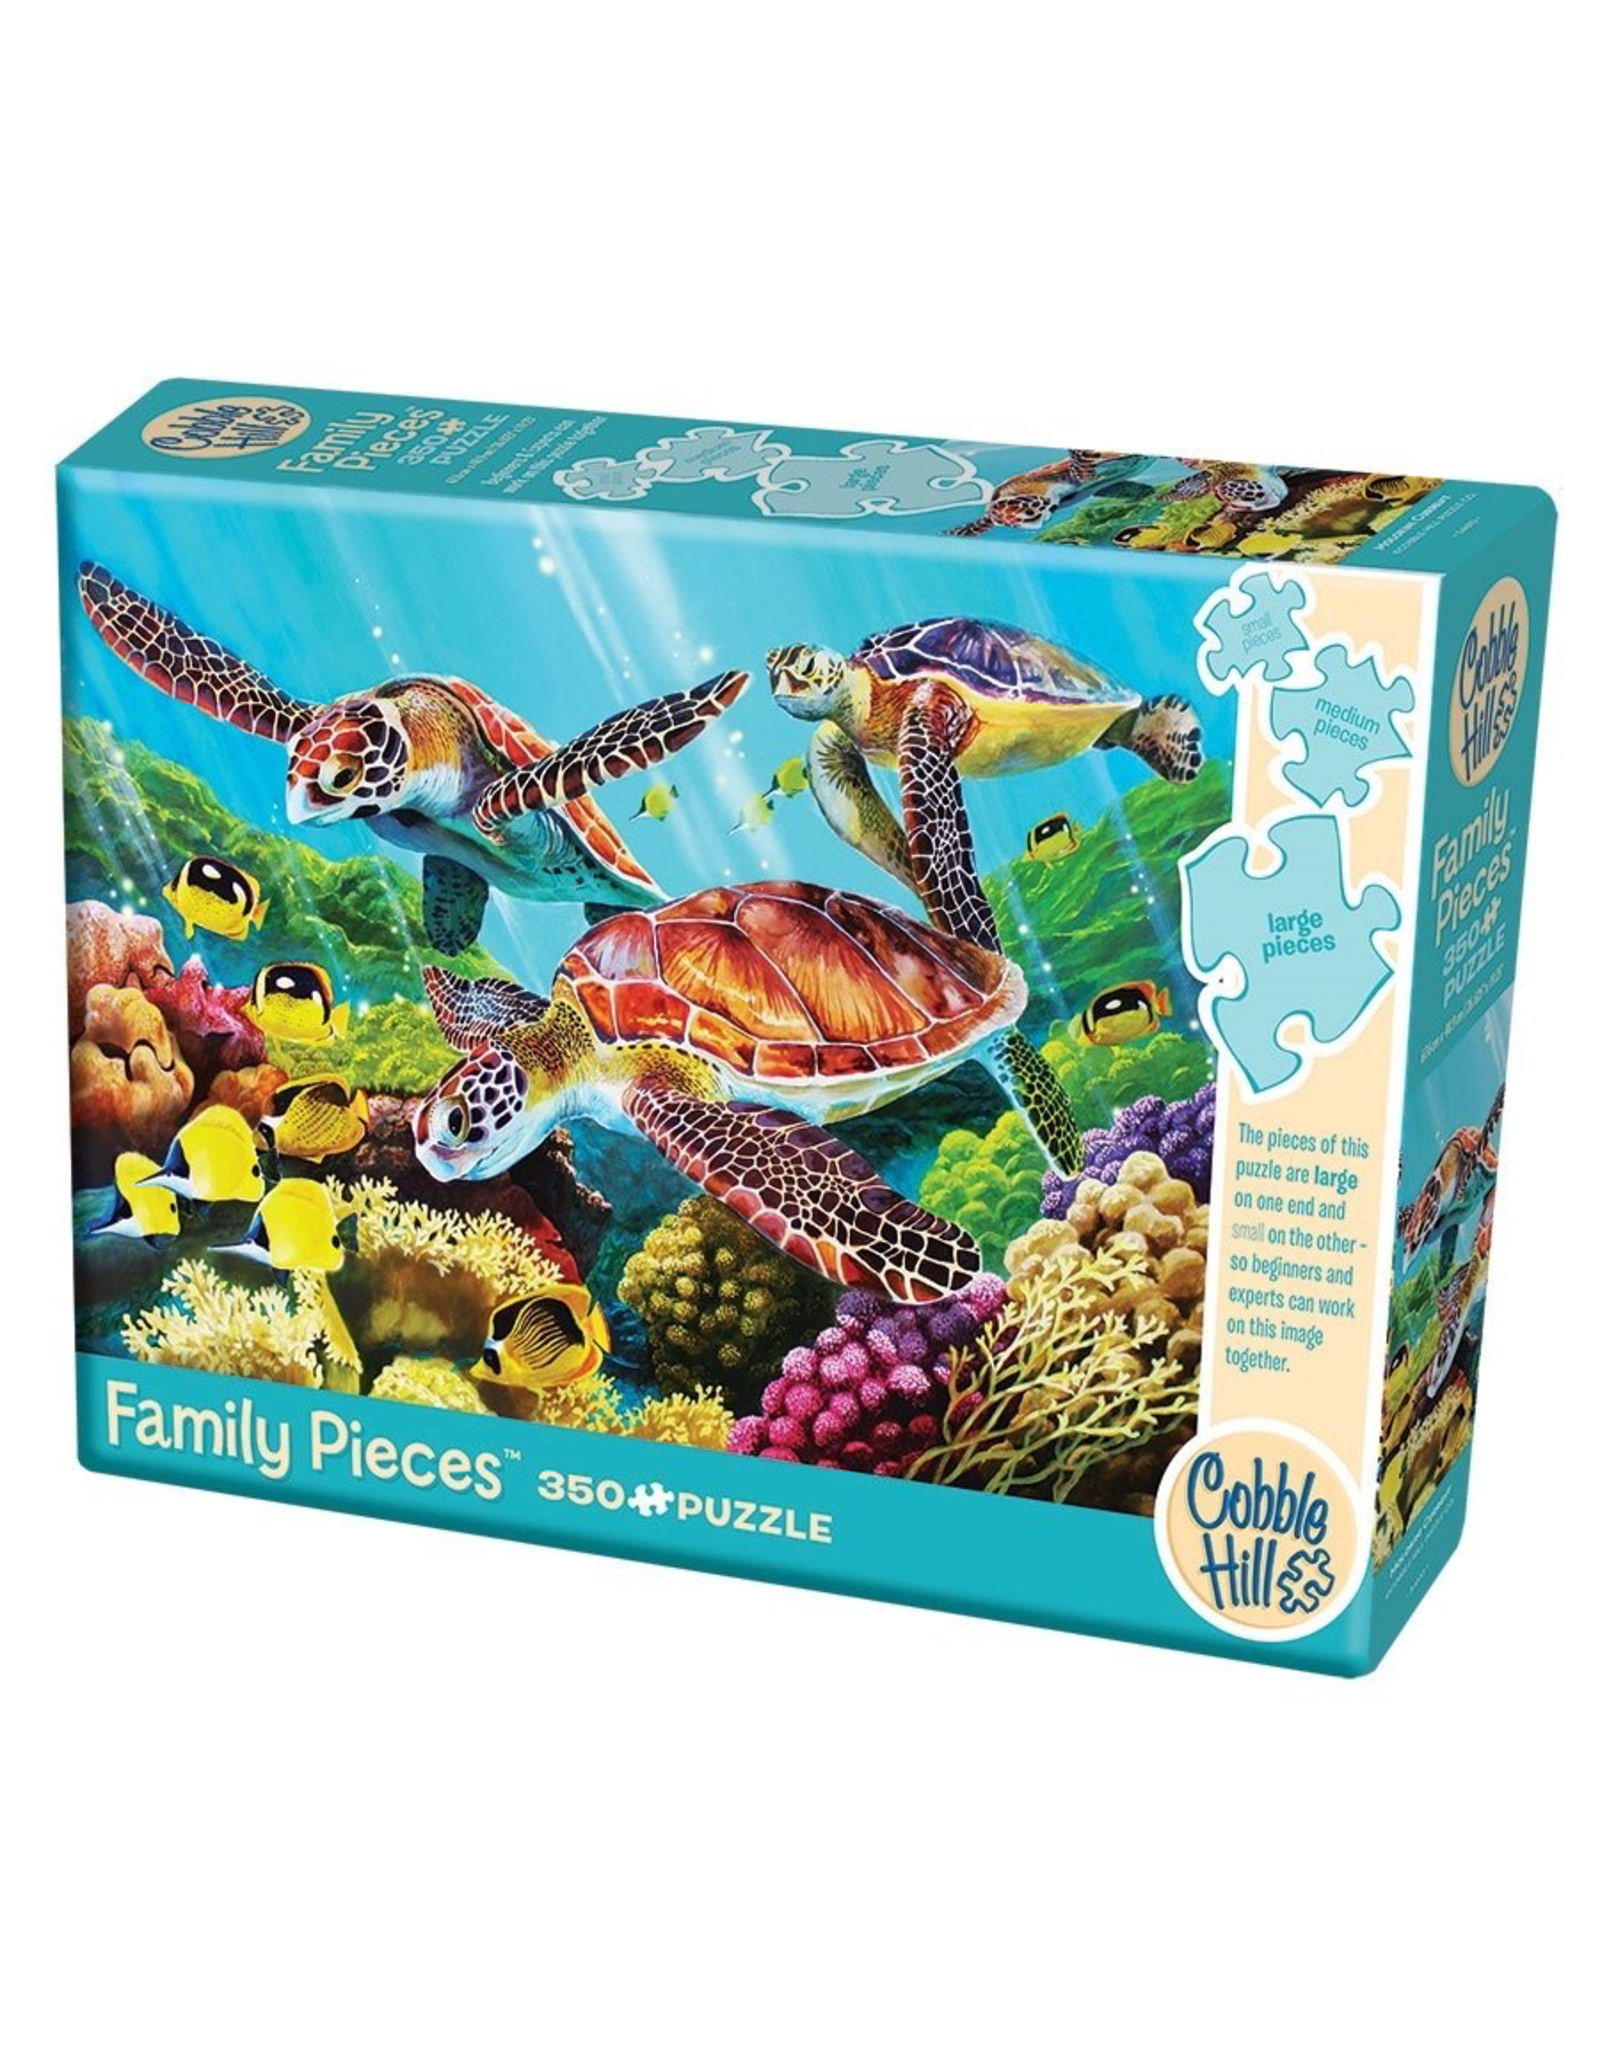 Cobble Hill Puzzles MOLOKINI CURRENT FAMILY PUZZLE 350 PIECES